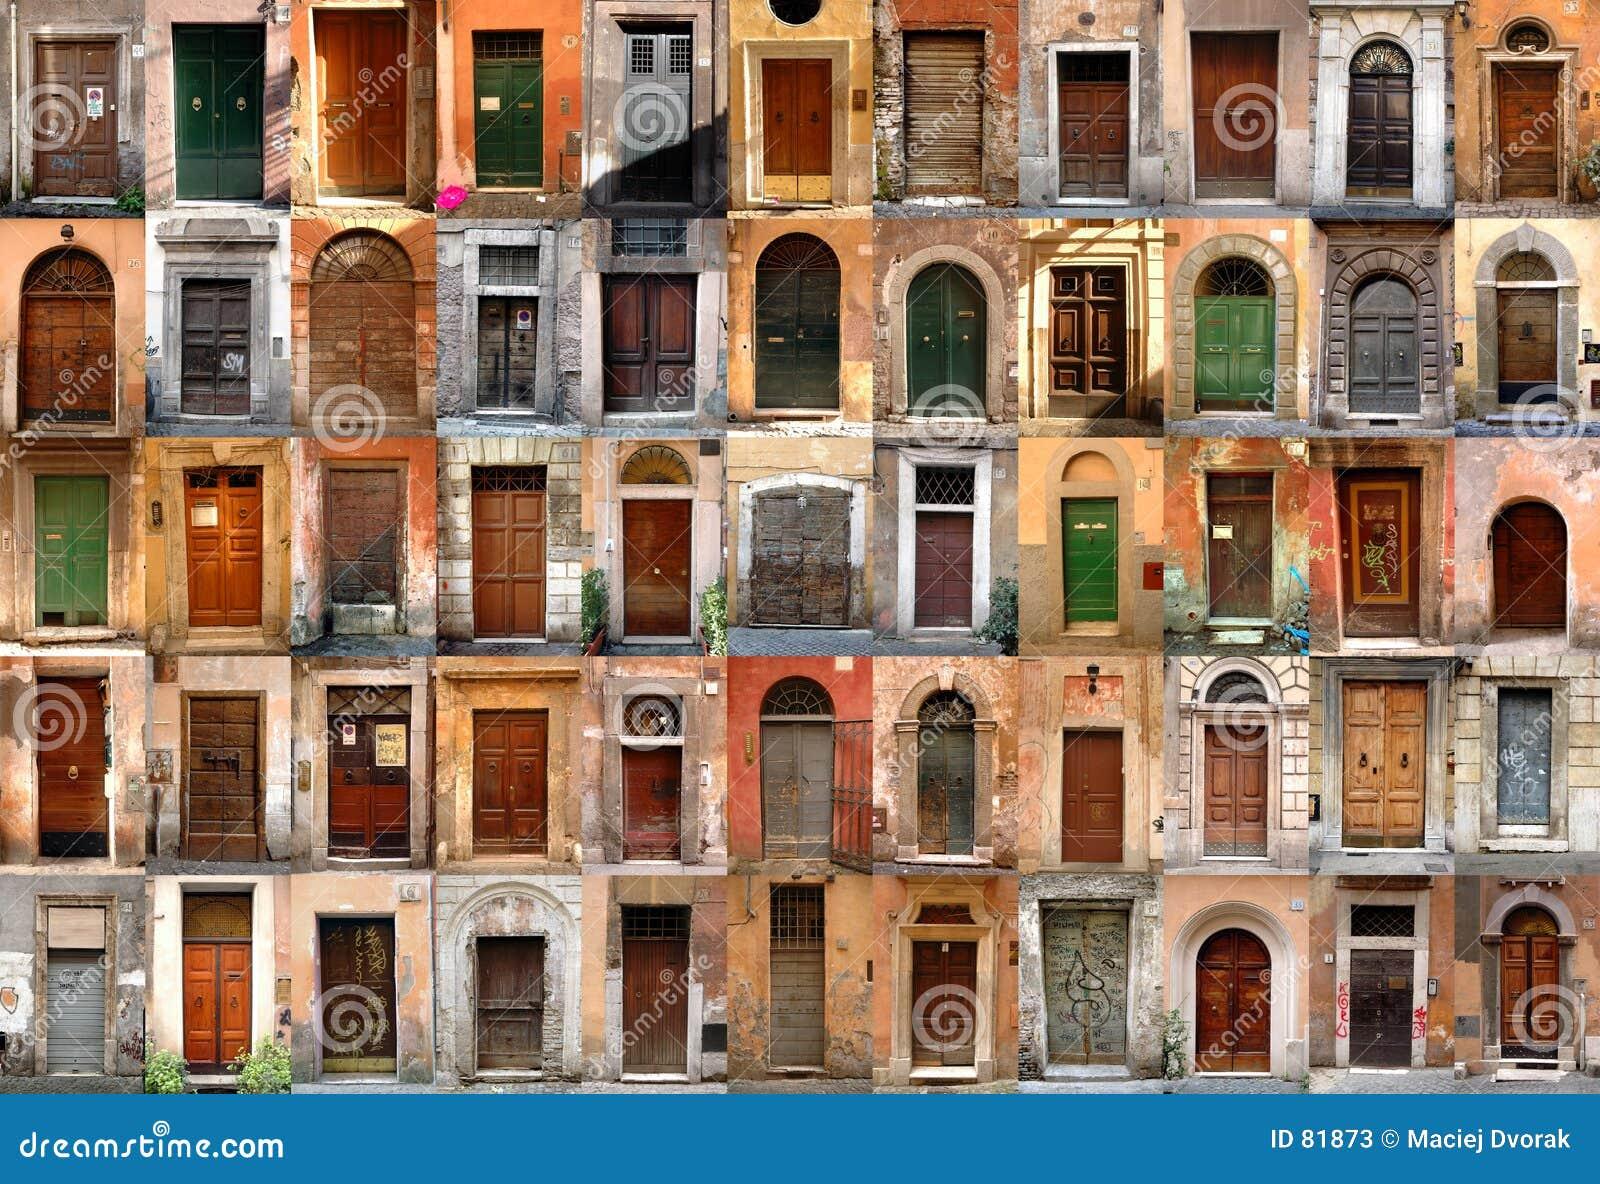 Doors - Rome, Italy